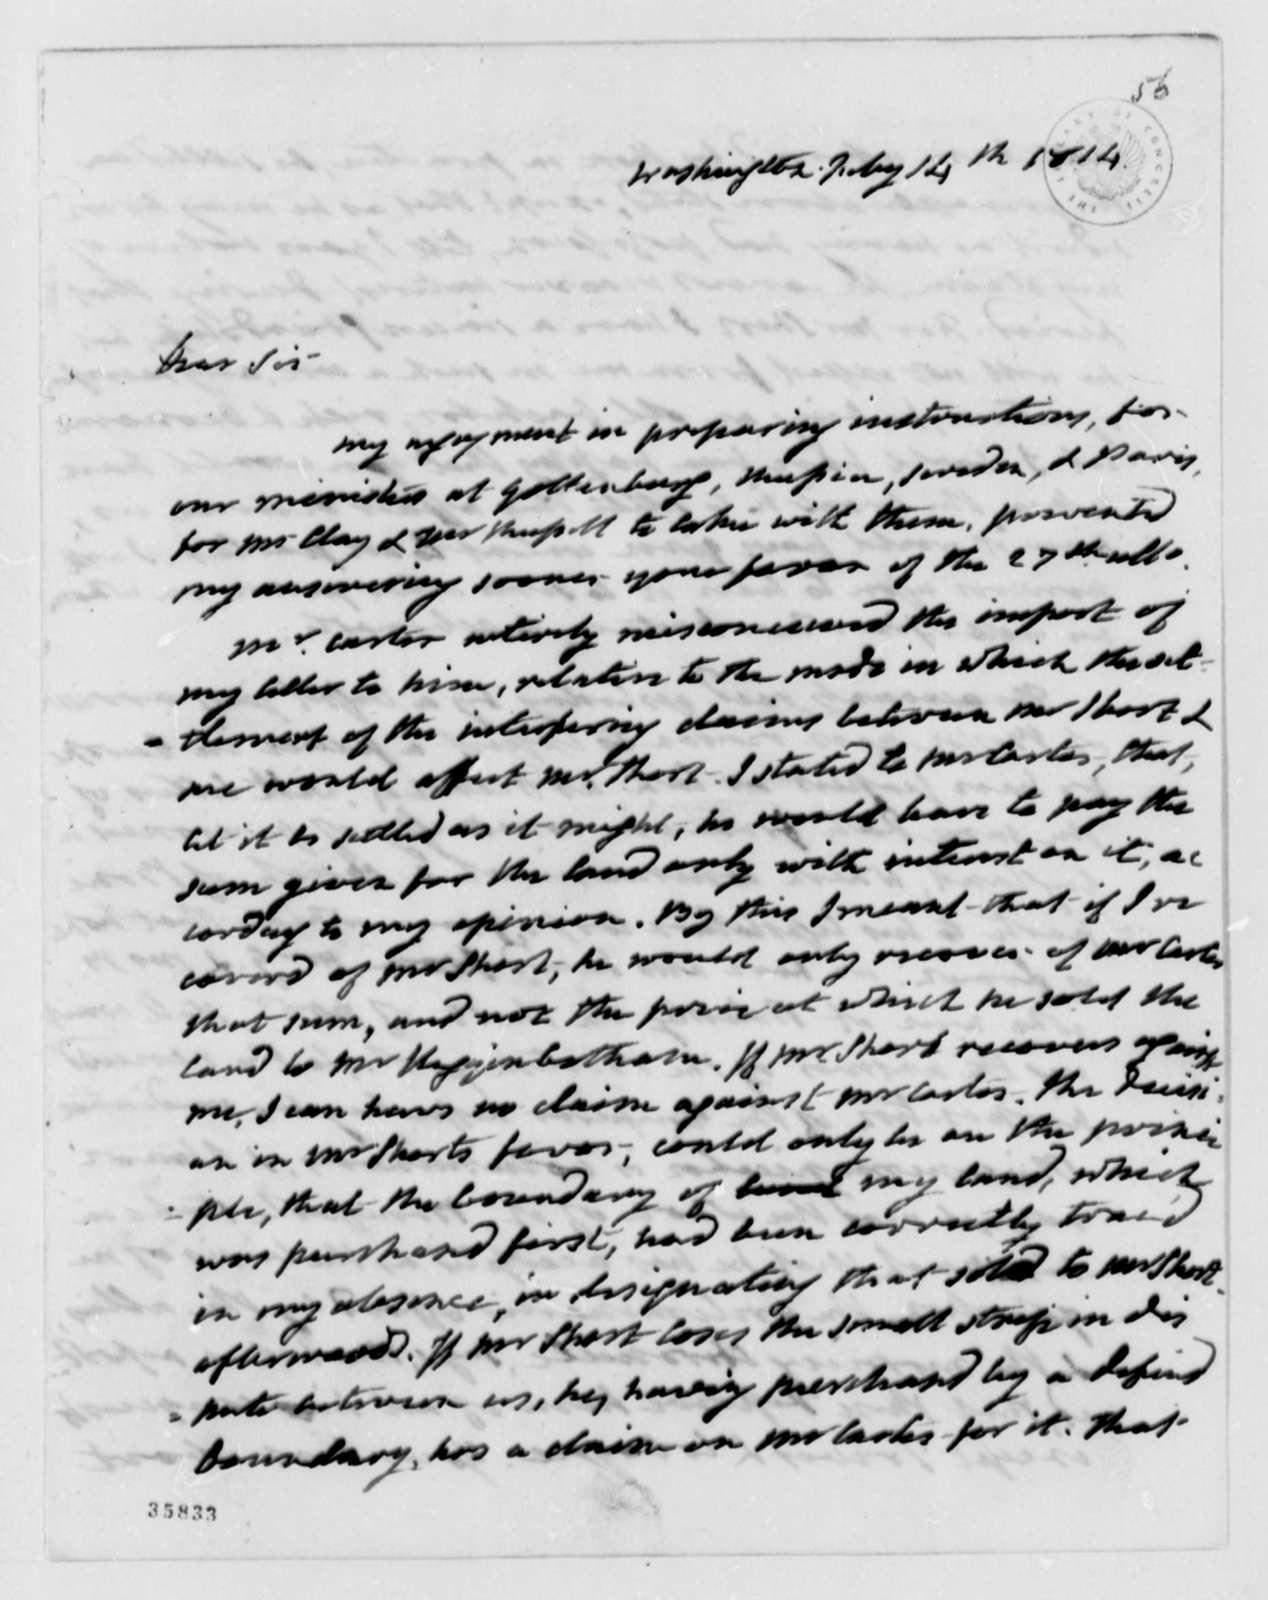 James Monroe to Thomas Jefferson, July 14, 1814